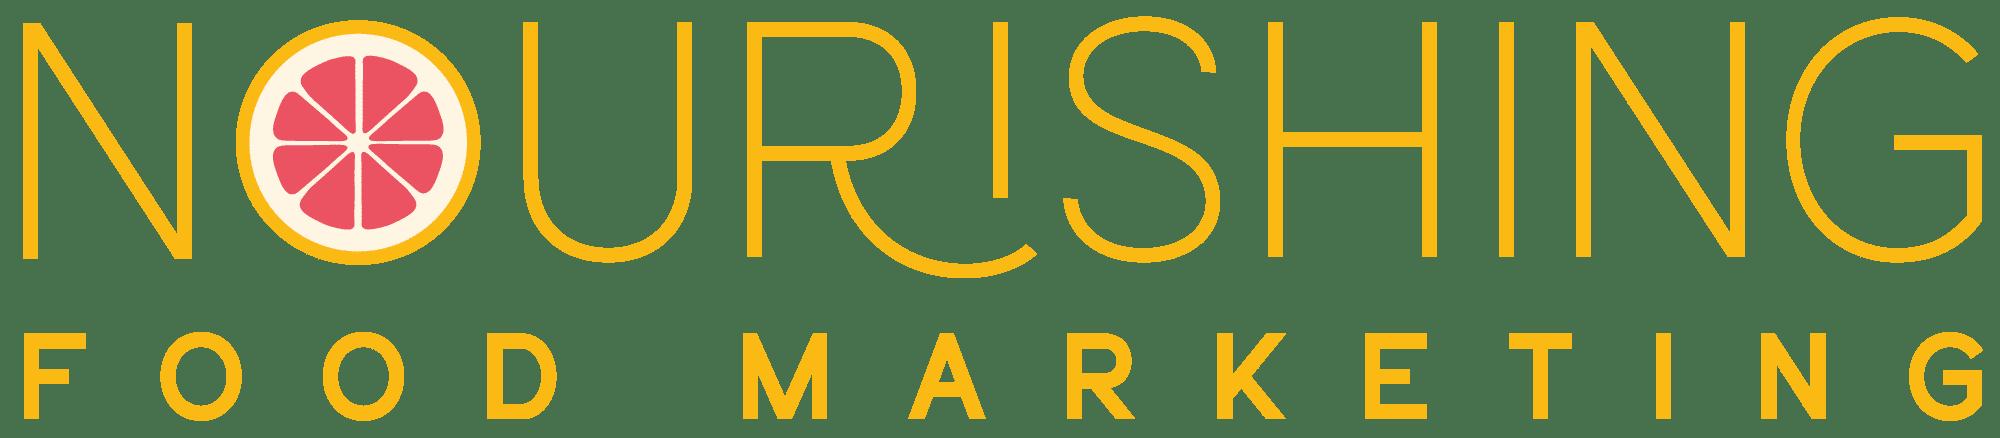 nourishing food marketing logo